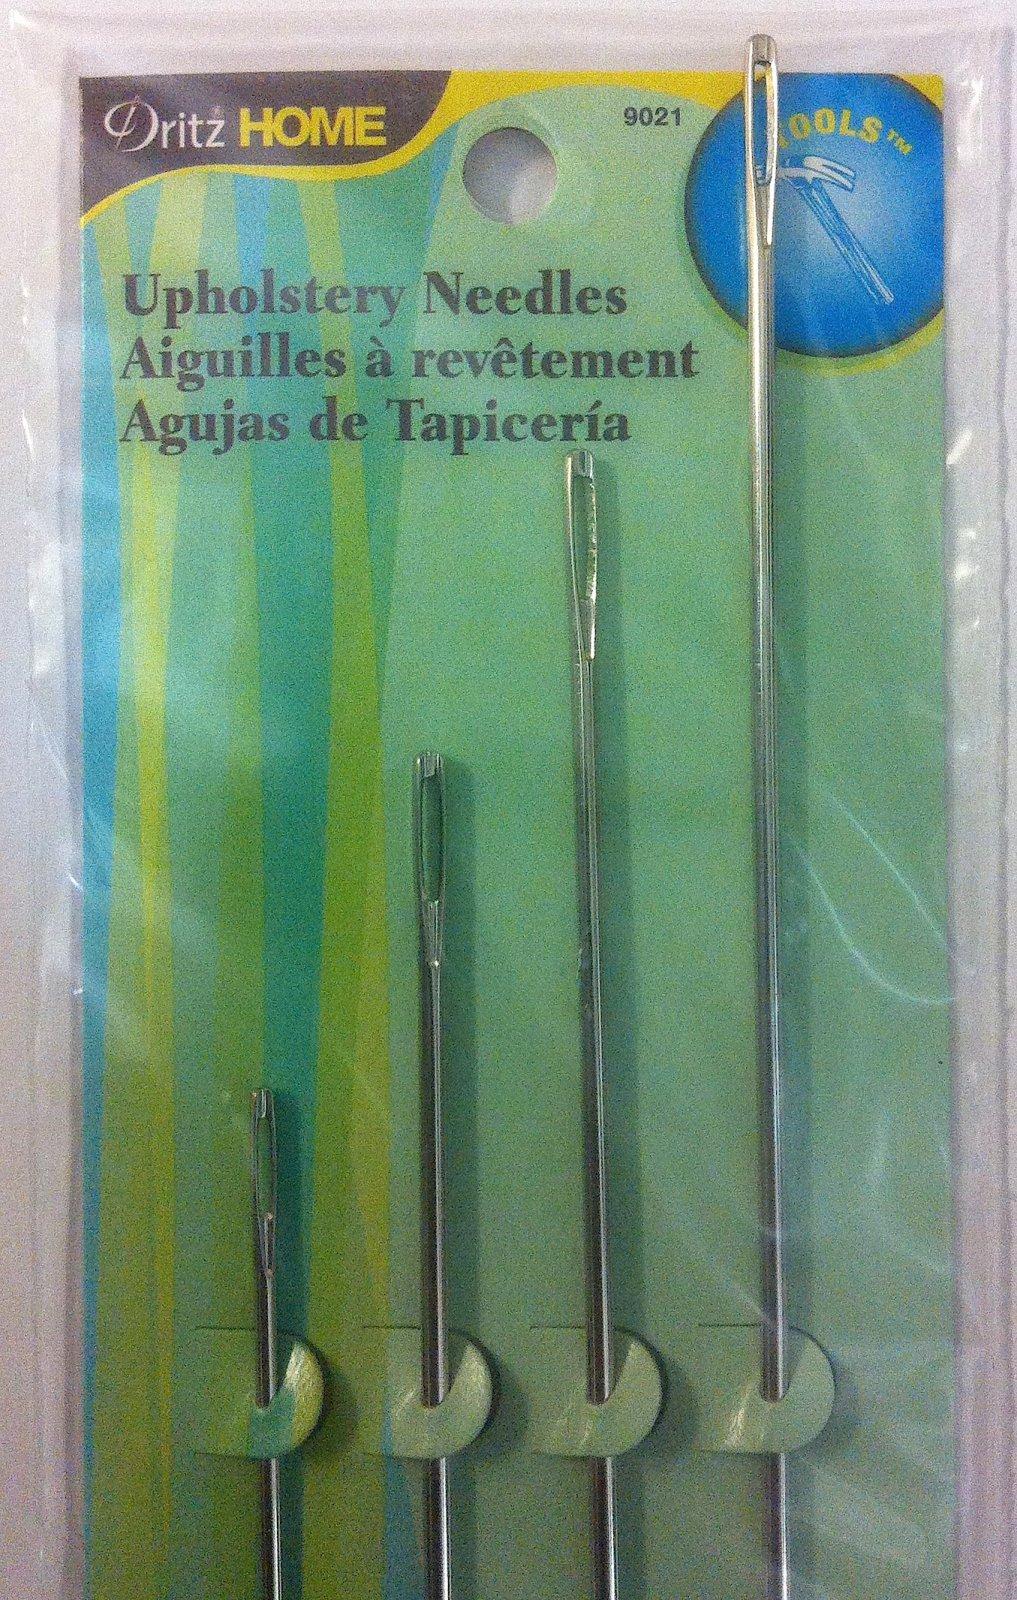 Dritz Upholstery Needles